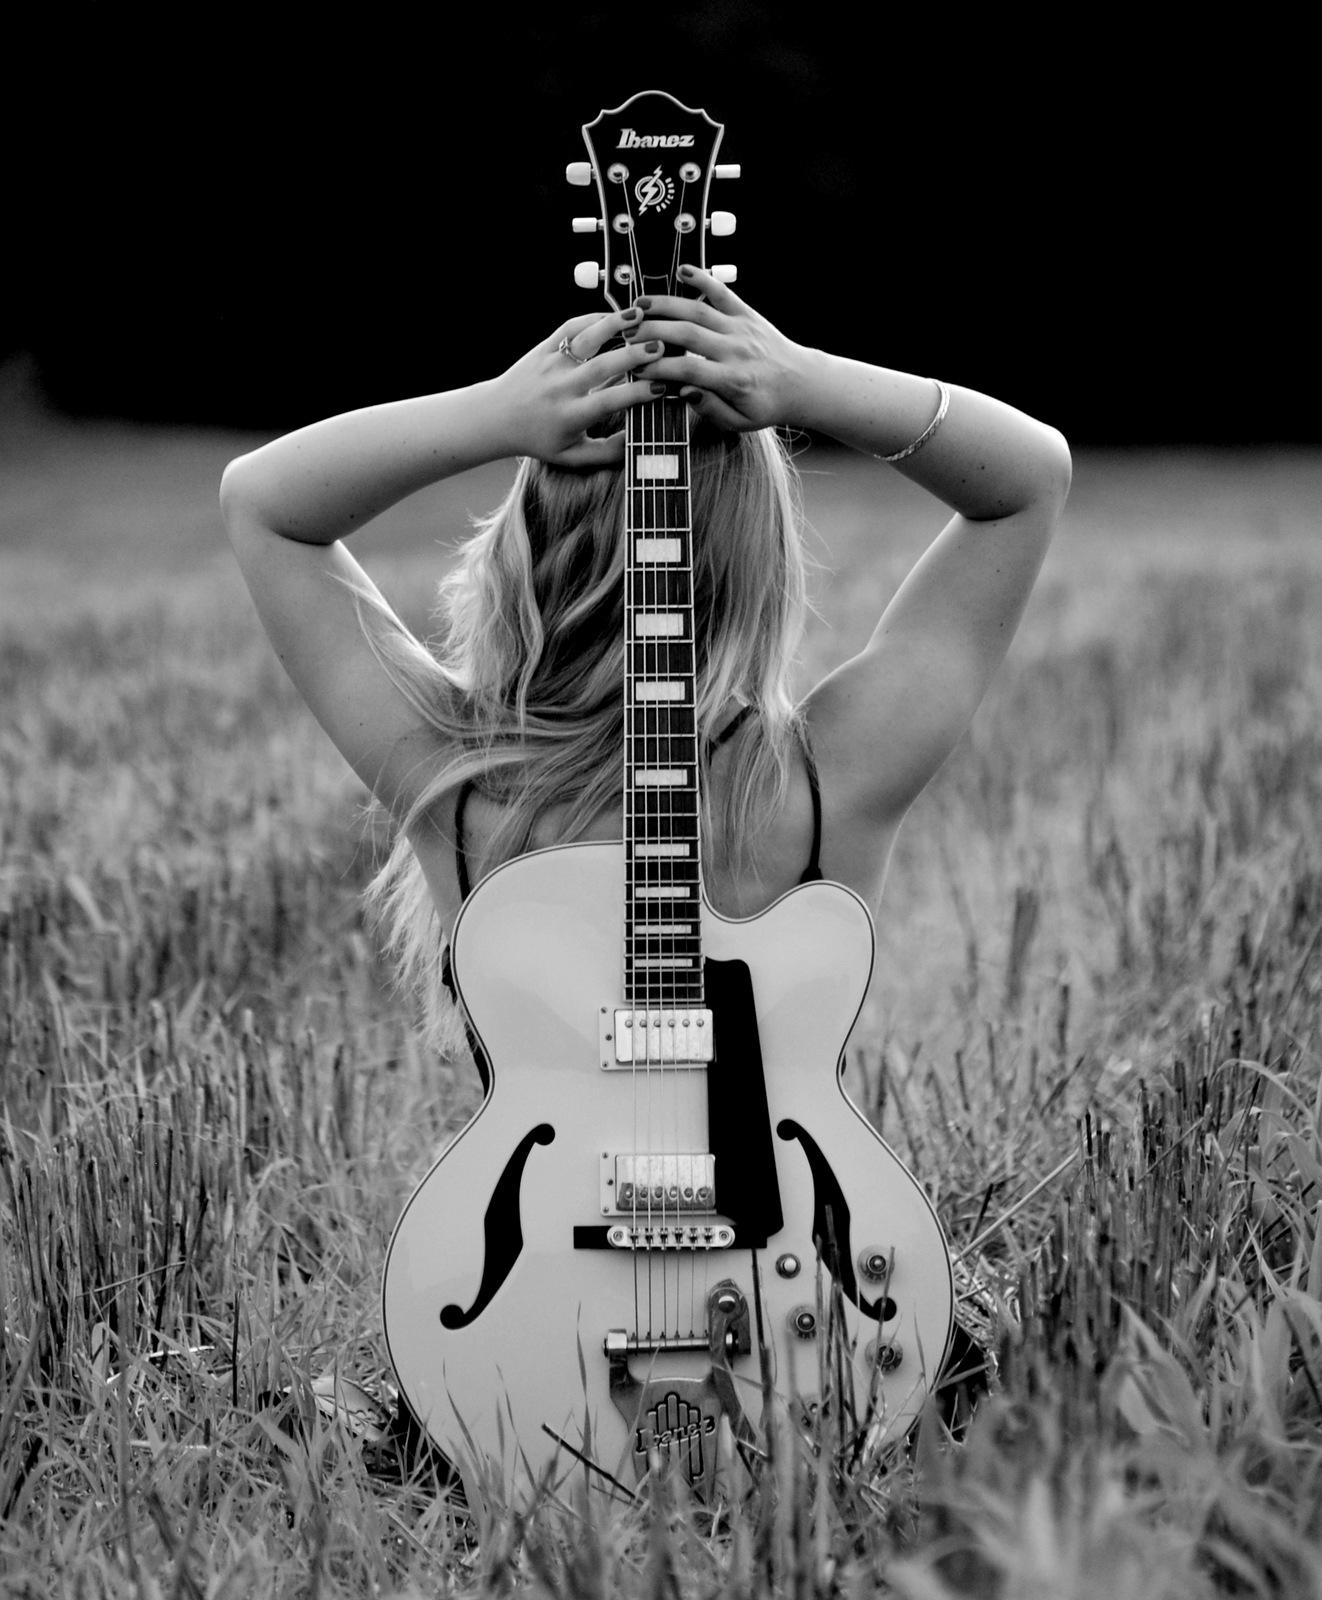 guitar silohuette.JPG